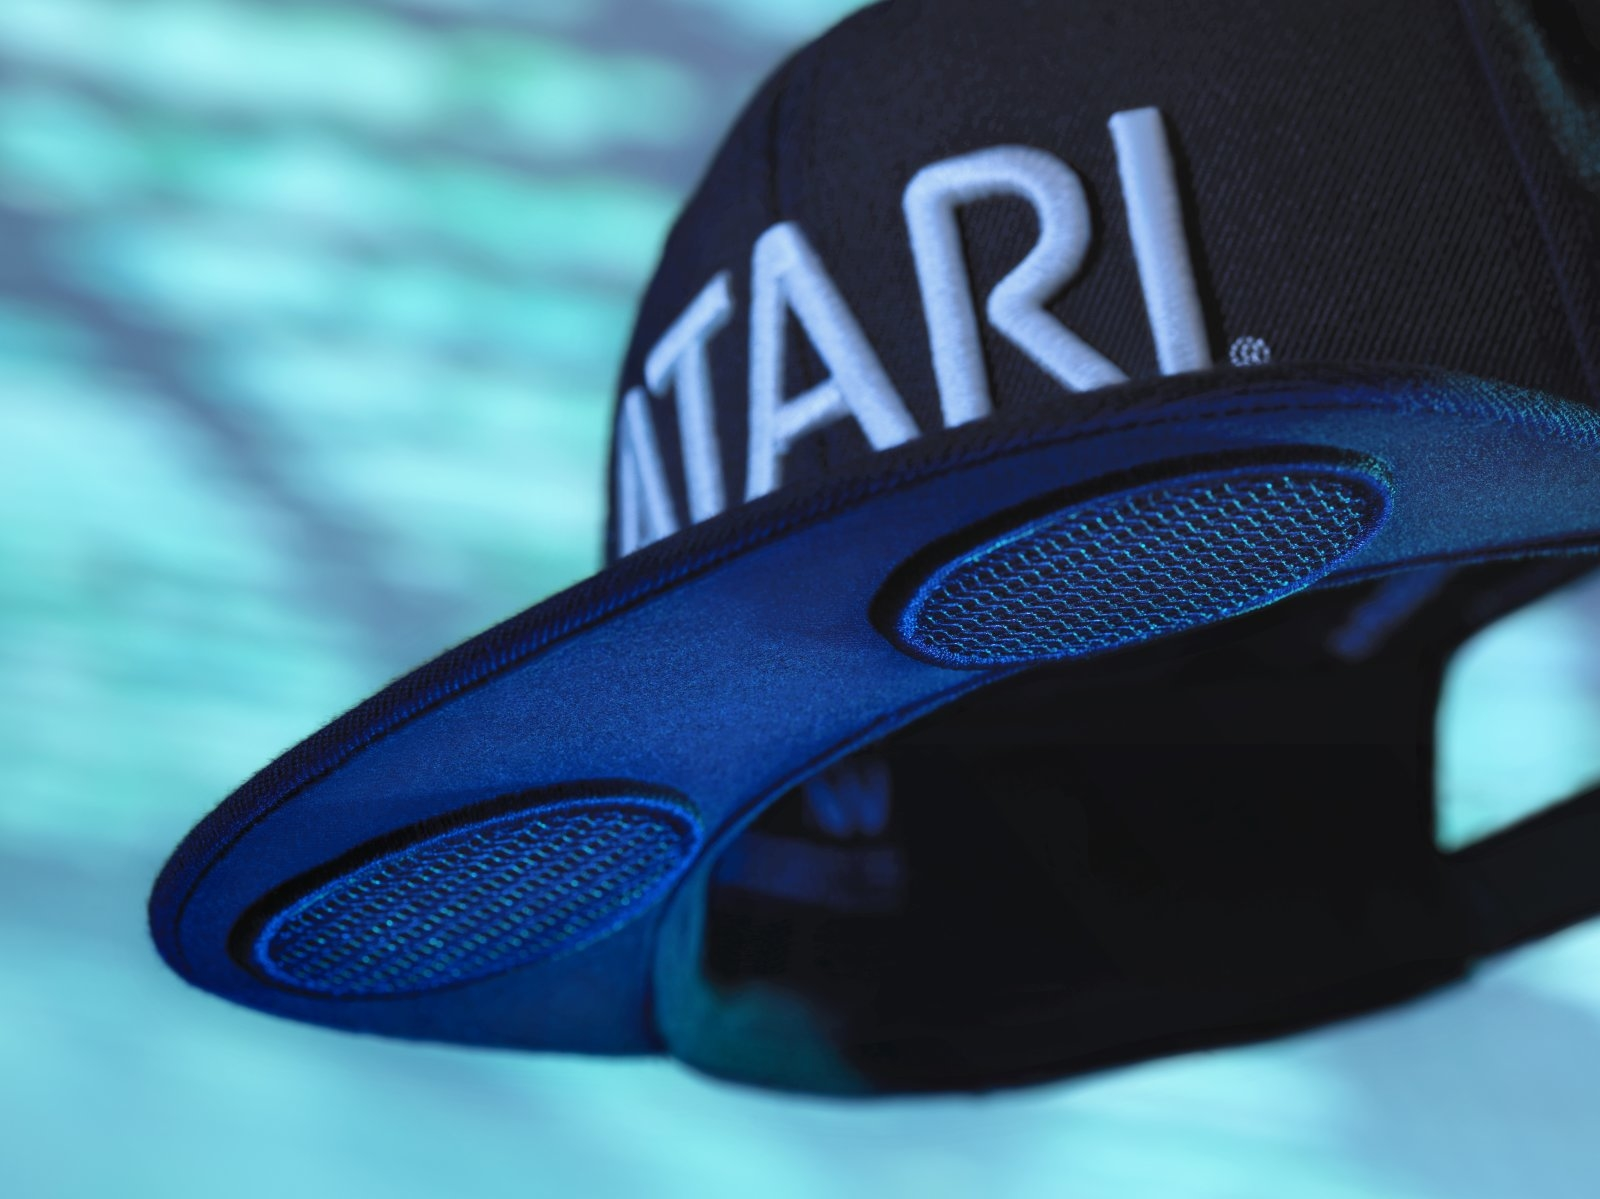 Atari Baseballcap mit Lautsprecher